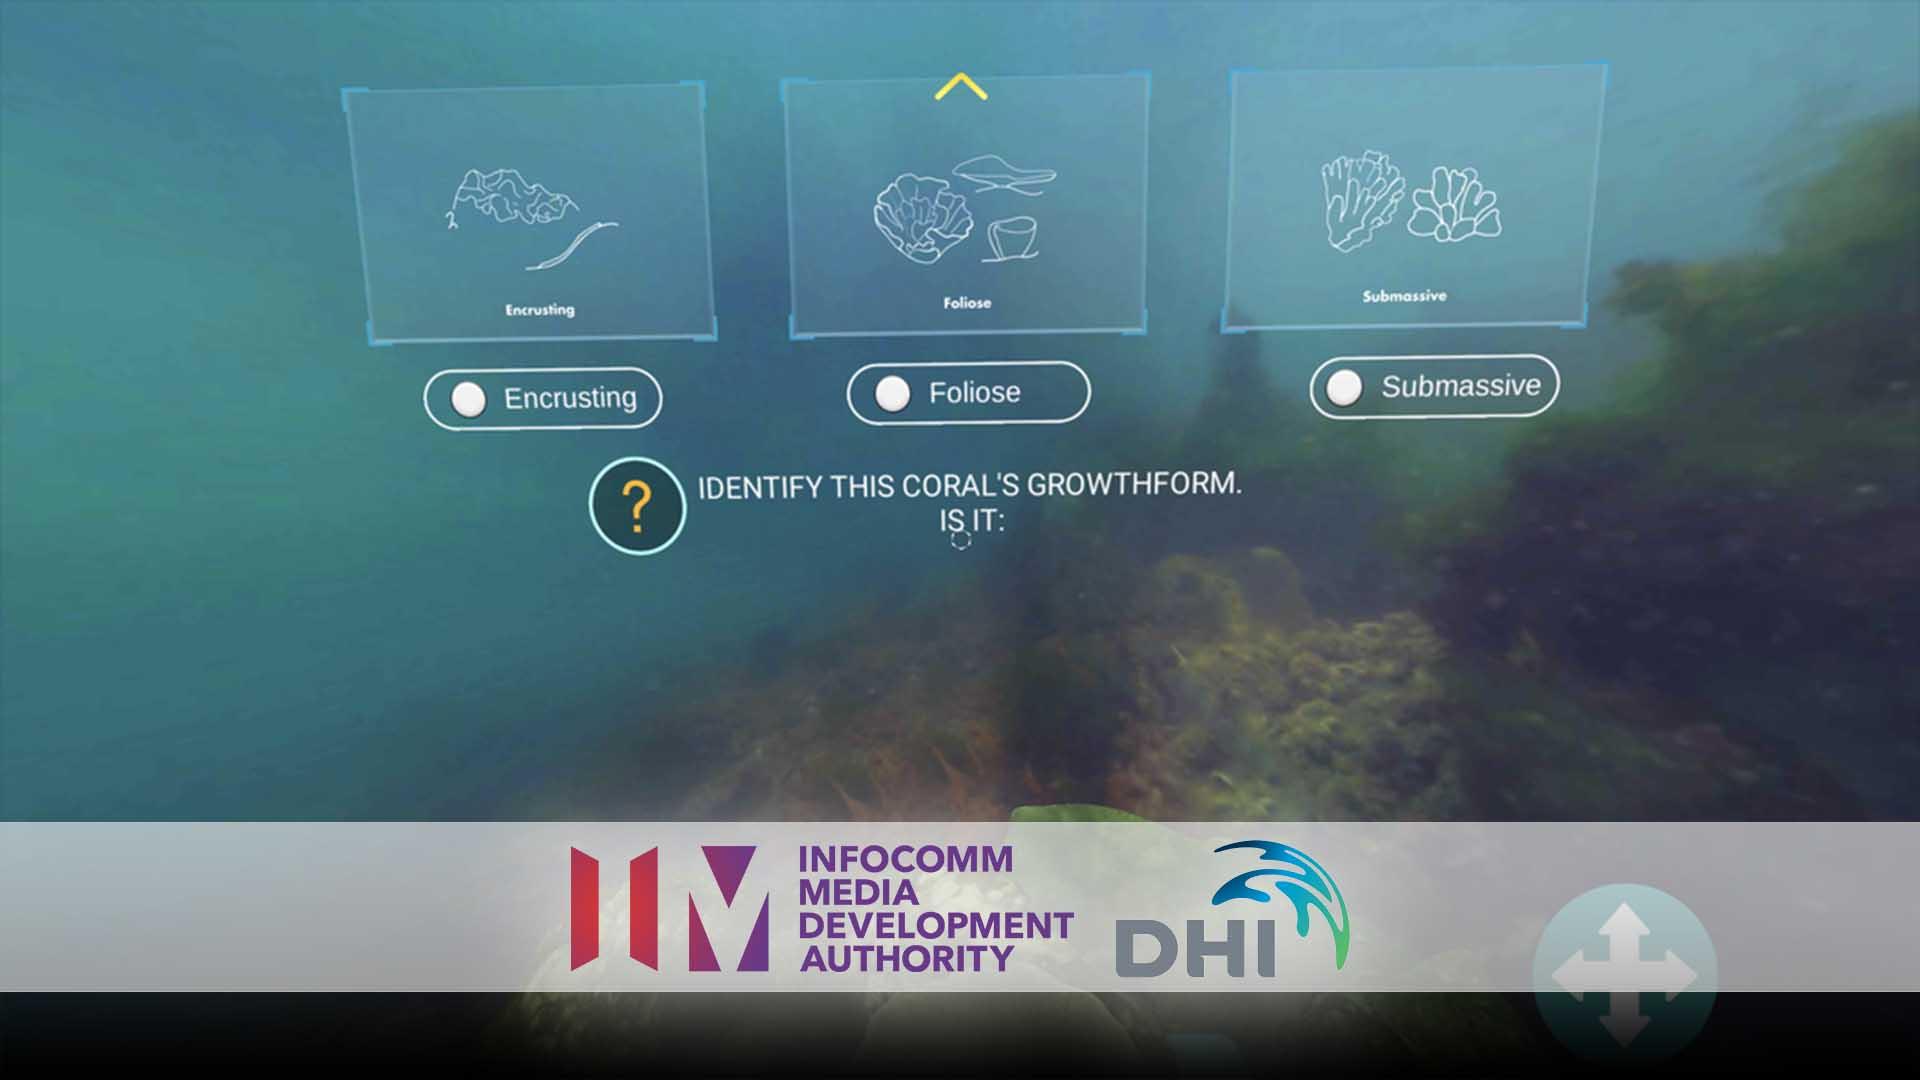 DHI Eyes On Habitat VR Training